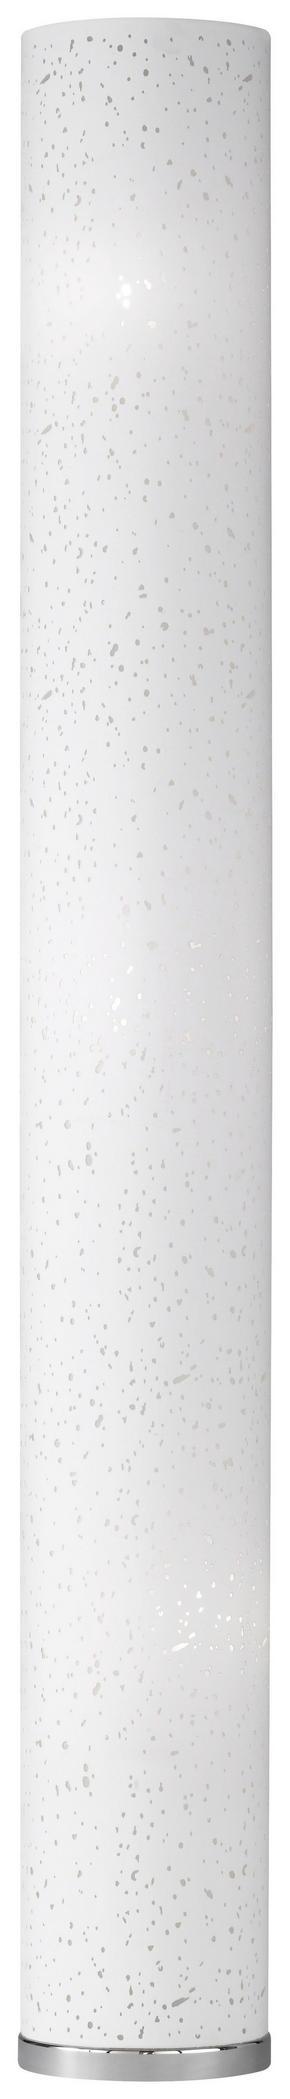 GOLVLAMPA - vit/kromfärg, Klassisk, metall/textil (156cm)